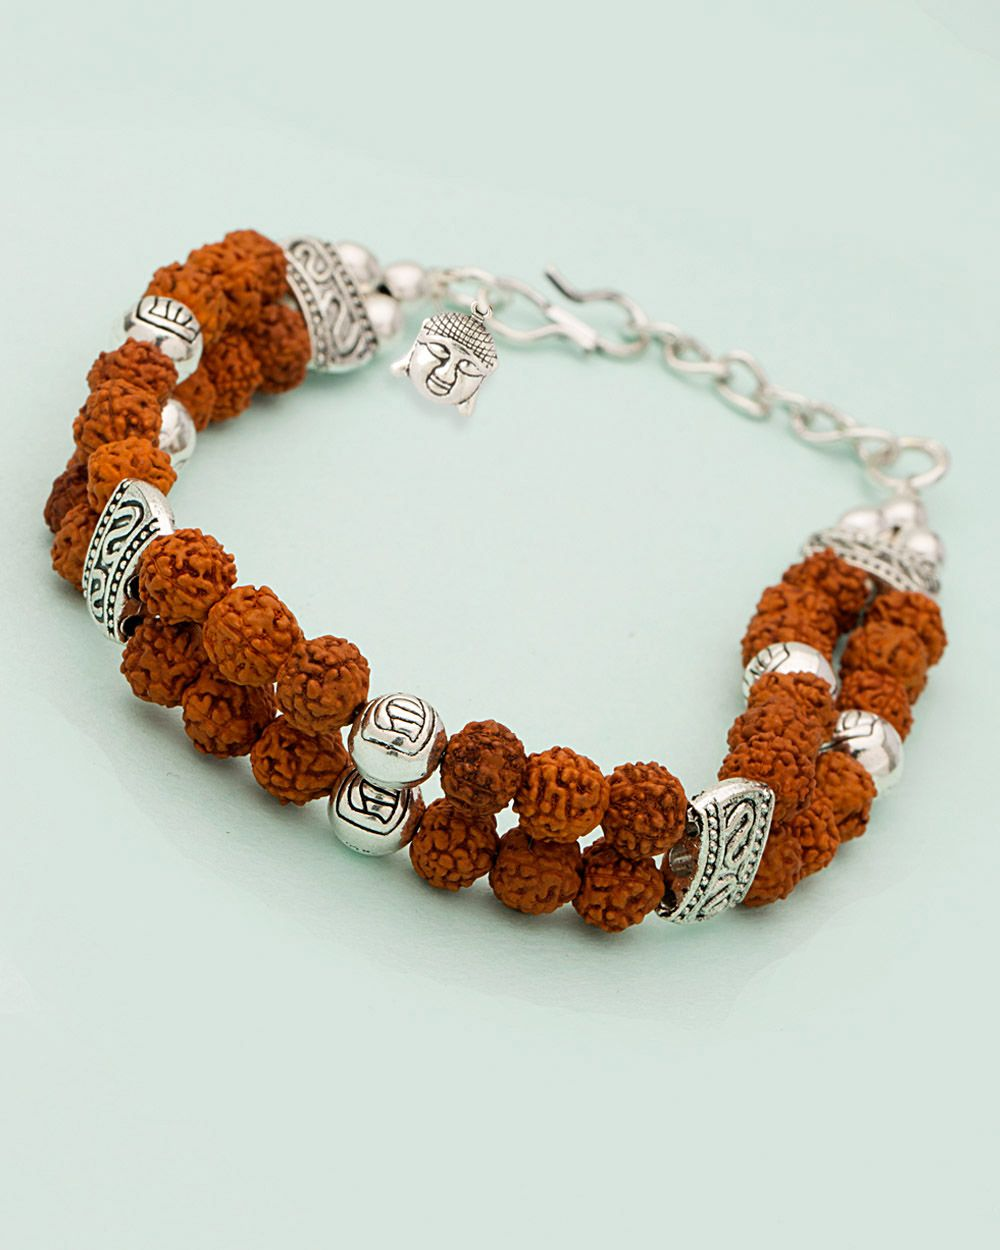 956a4a5c261 rudraksha gold jewellery,rudraksha jewellery online,rudraksha designs  jewelry,rudraksha jewellery design,rudraksha beads bali,aum rudraksha, rudraksha ...